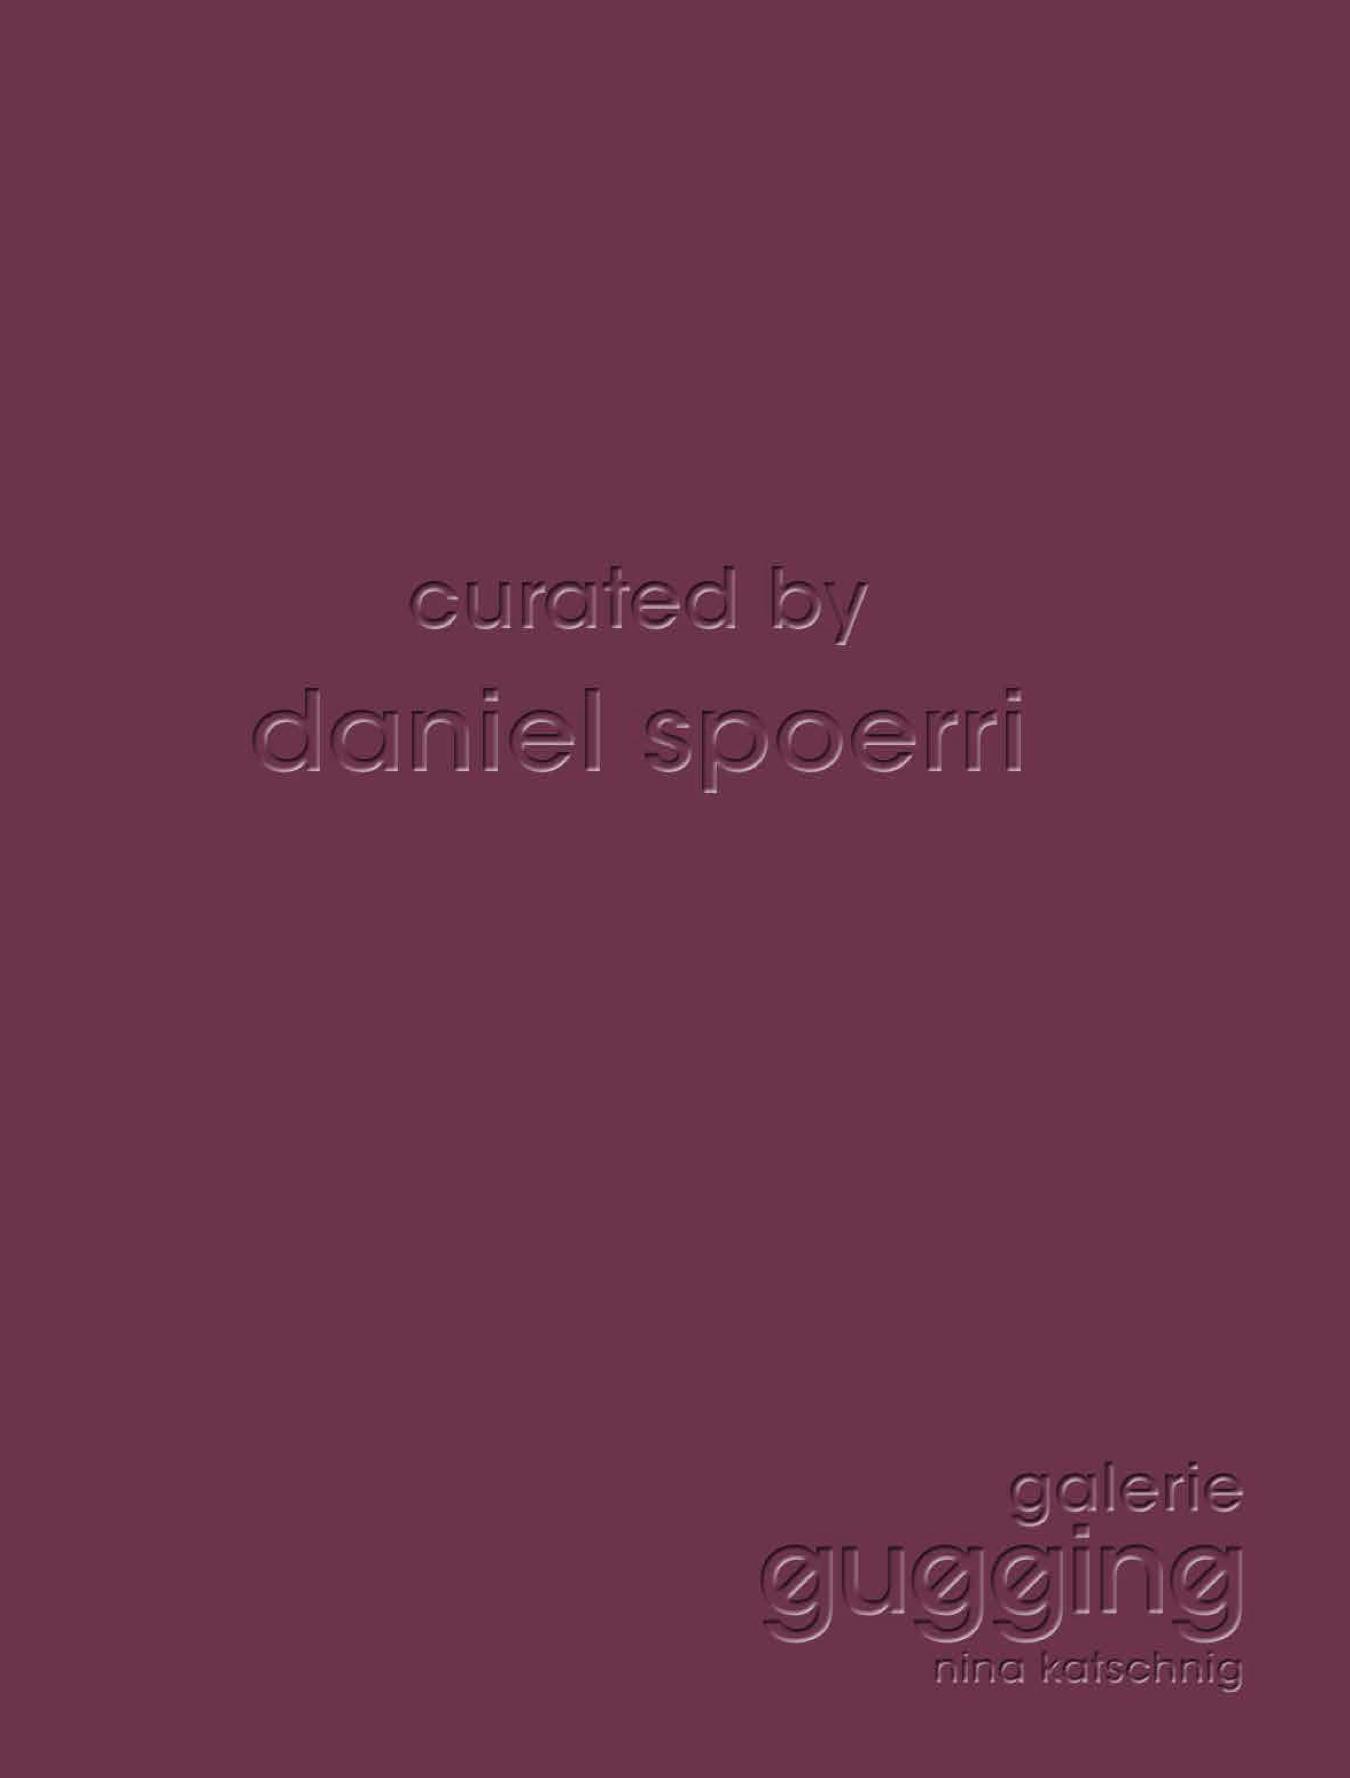 Catalogue curated by daniel spoerri